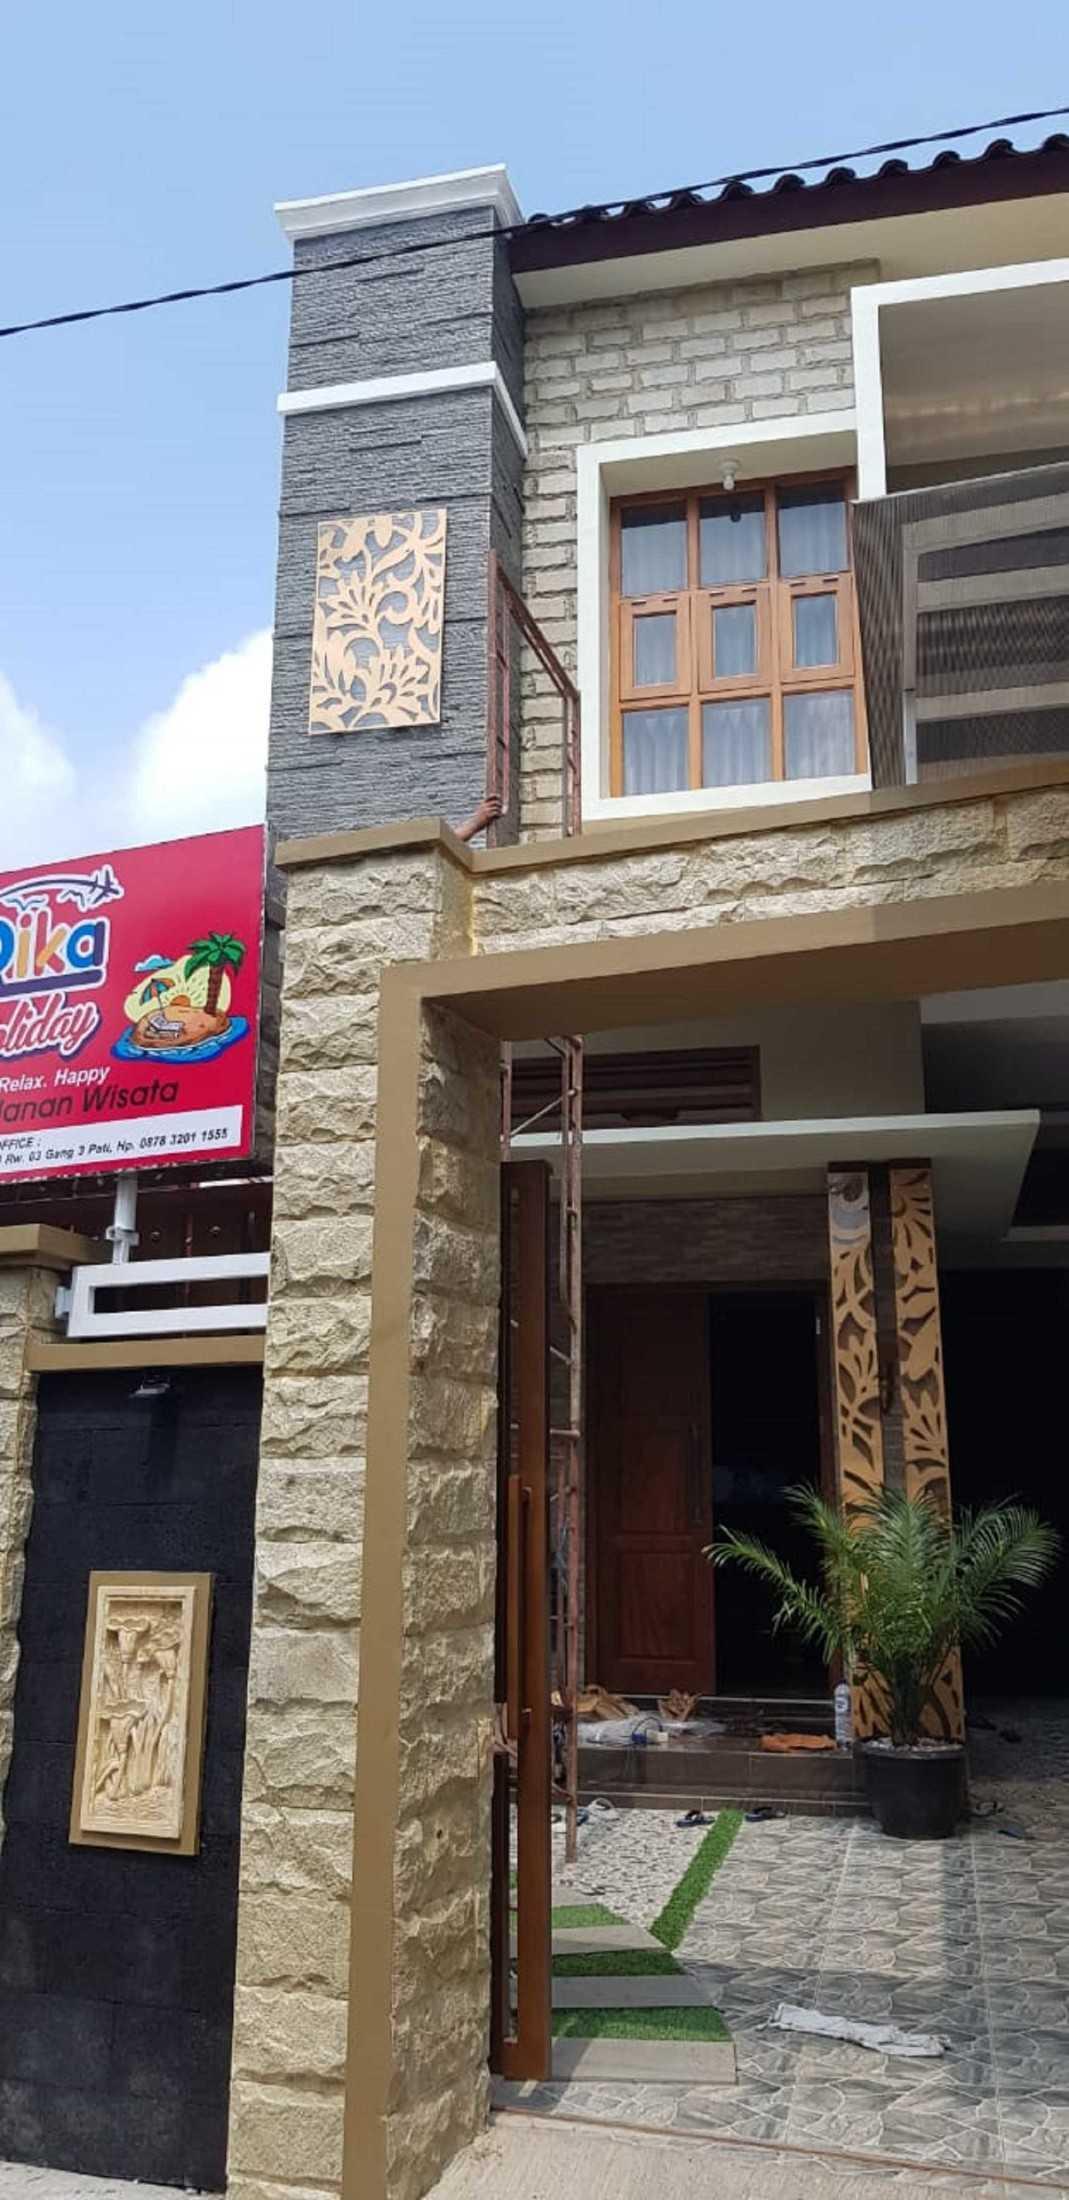 Rekoo Indonesia Acryclic Fasad & Interior Pati, Kec. Pati, Kabupaten Pati, Jawa Tengah, Indonesia Pati, Kec. Pati, Kabupaten Pati, Jawa Tengah, Indonesia Rekoo-Indonesia-Acryclic-Fasad-Interior  133287